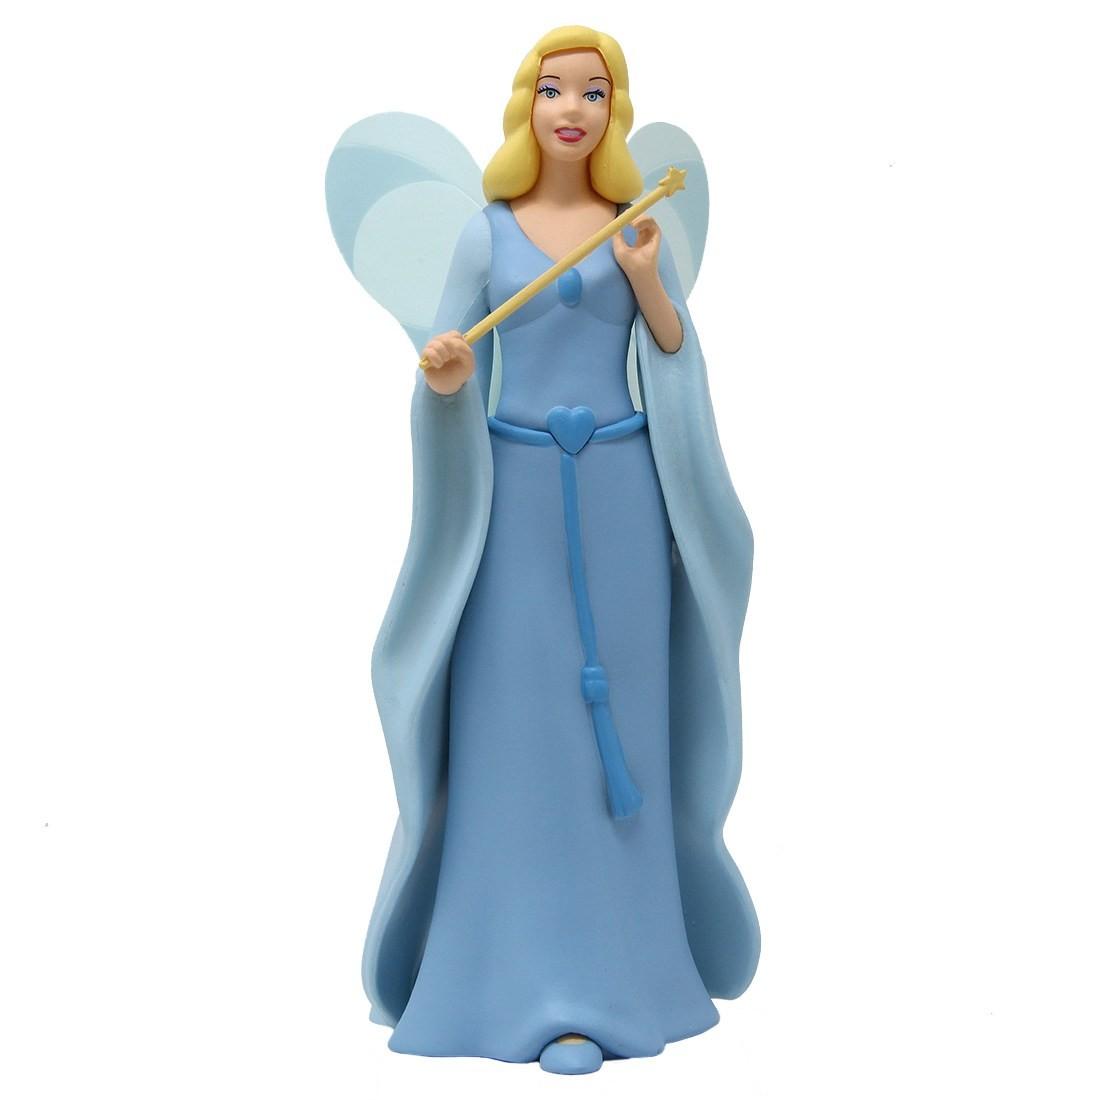 Medicom UDF Disney Series Pinocchio - Blue Fairy Ultra Detail Figure (blue)